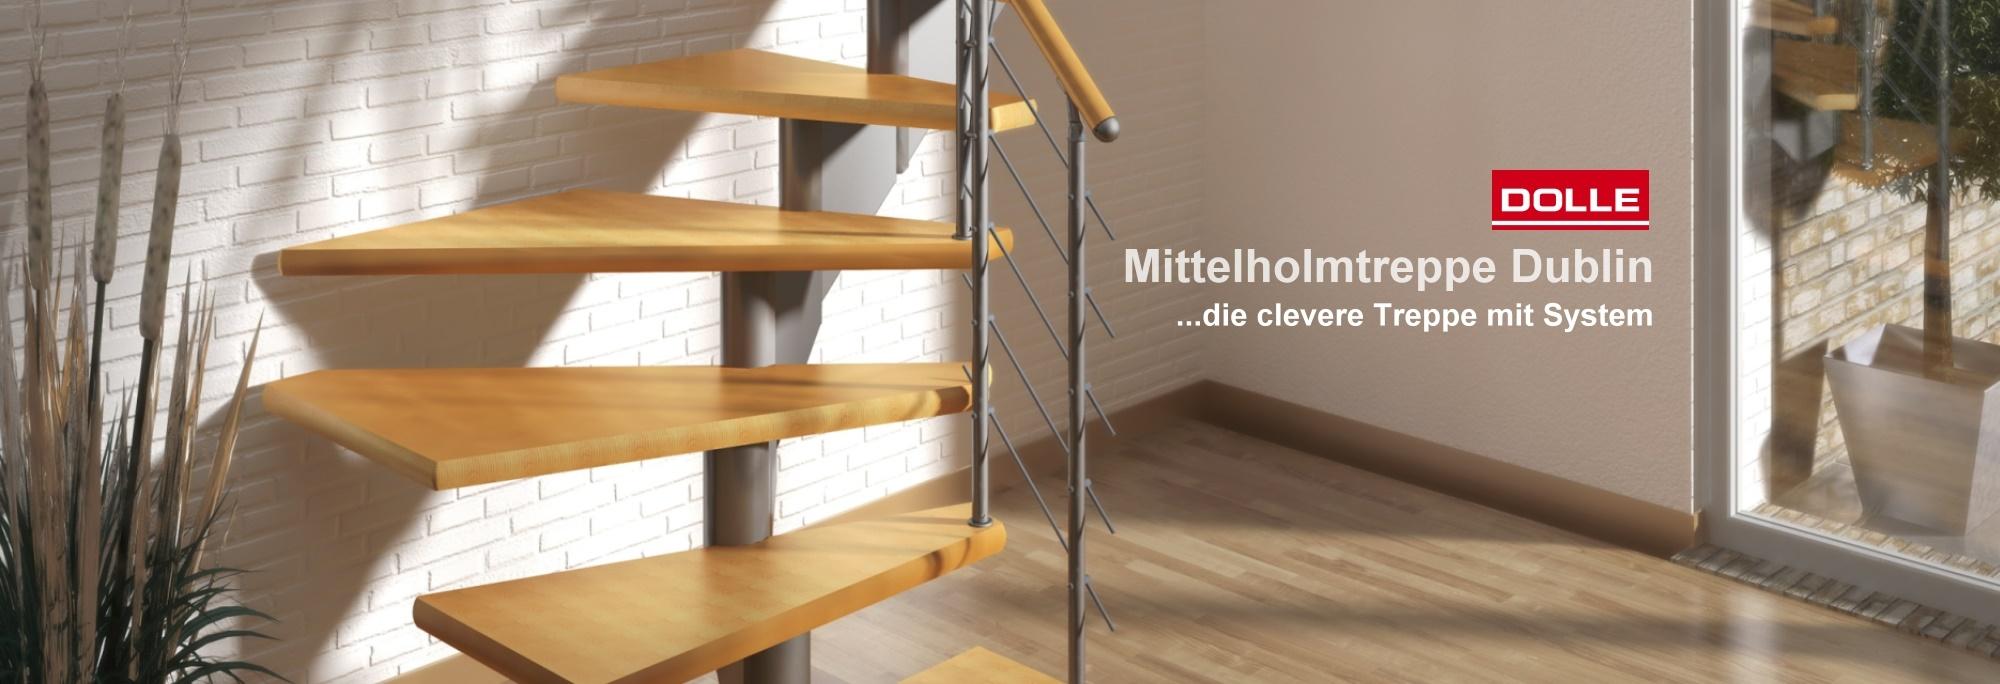 treppe planen berechnen fertigteile. Black Bedroom Furniture Sets. Home Design Ideas